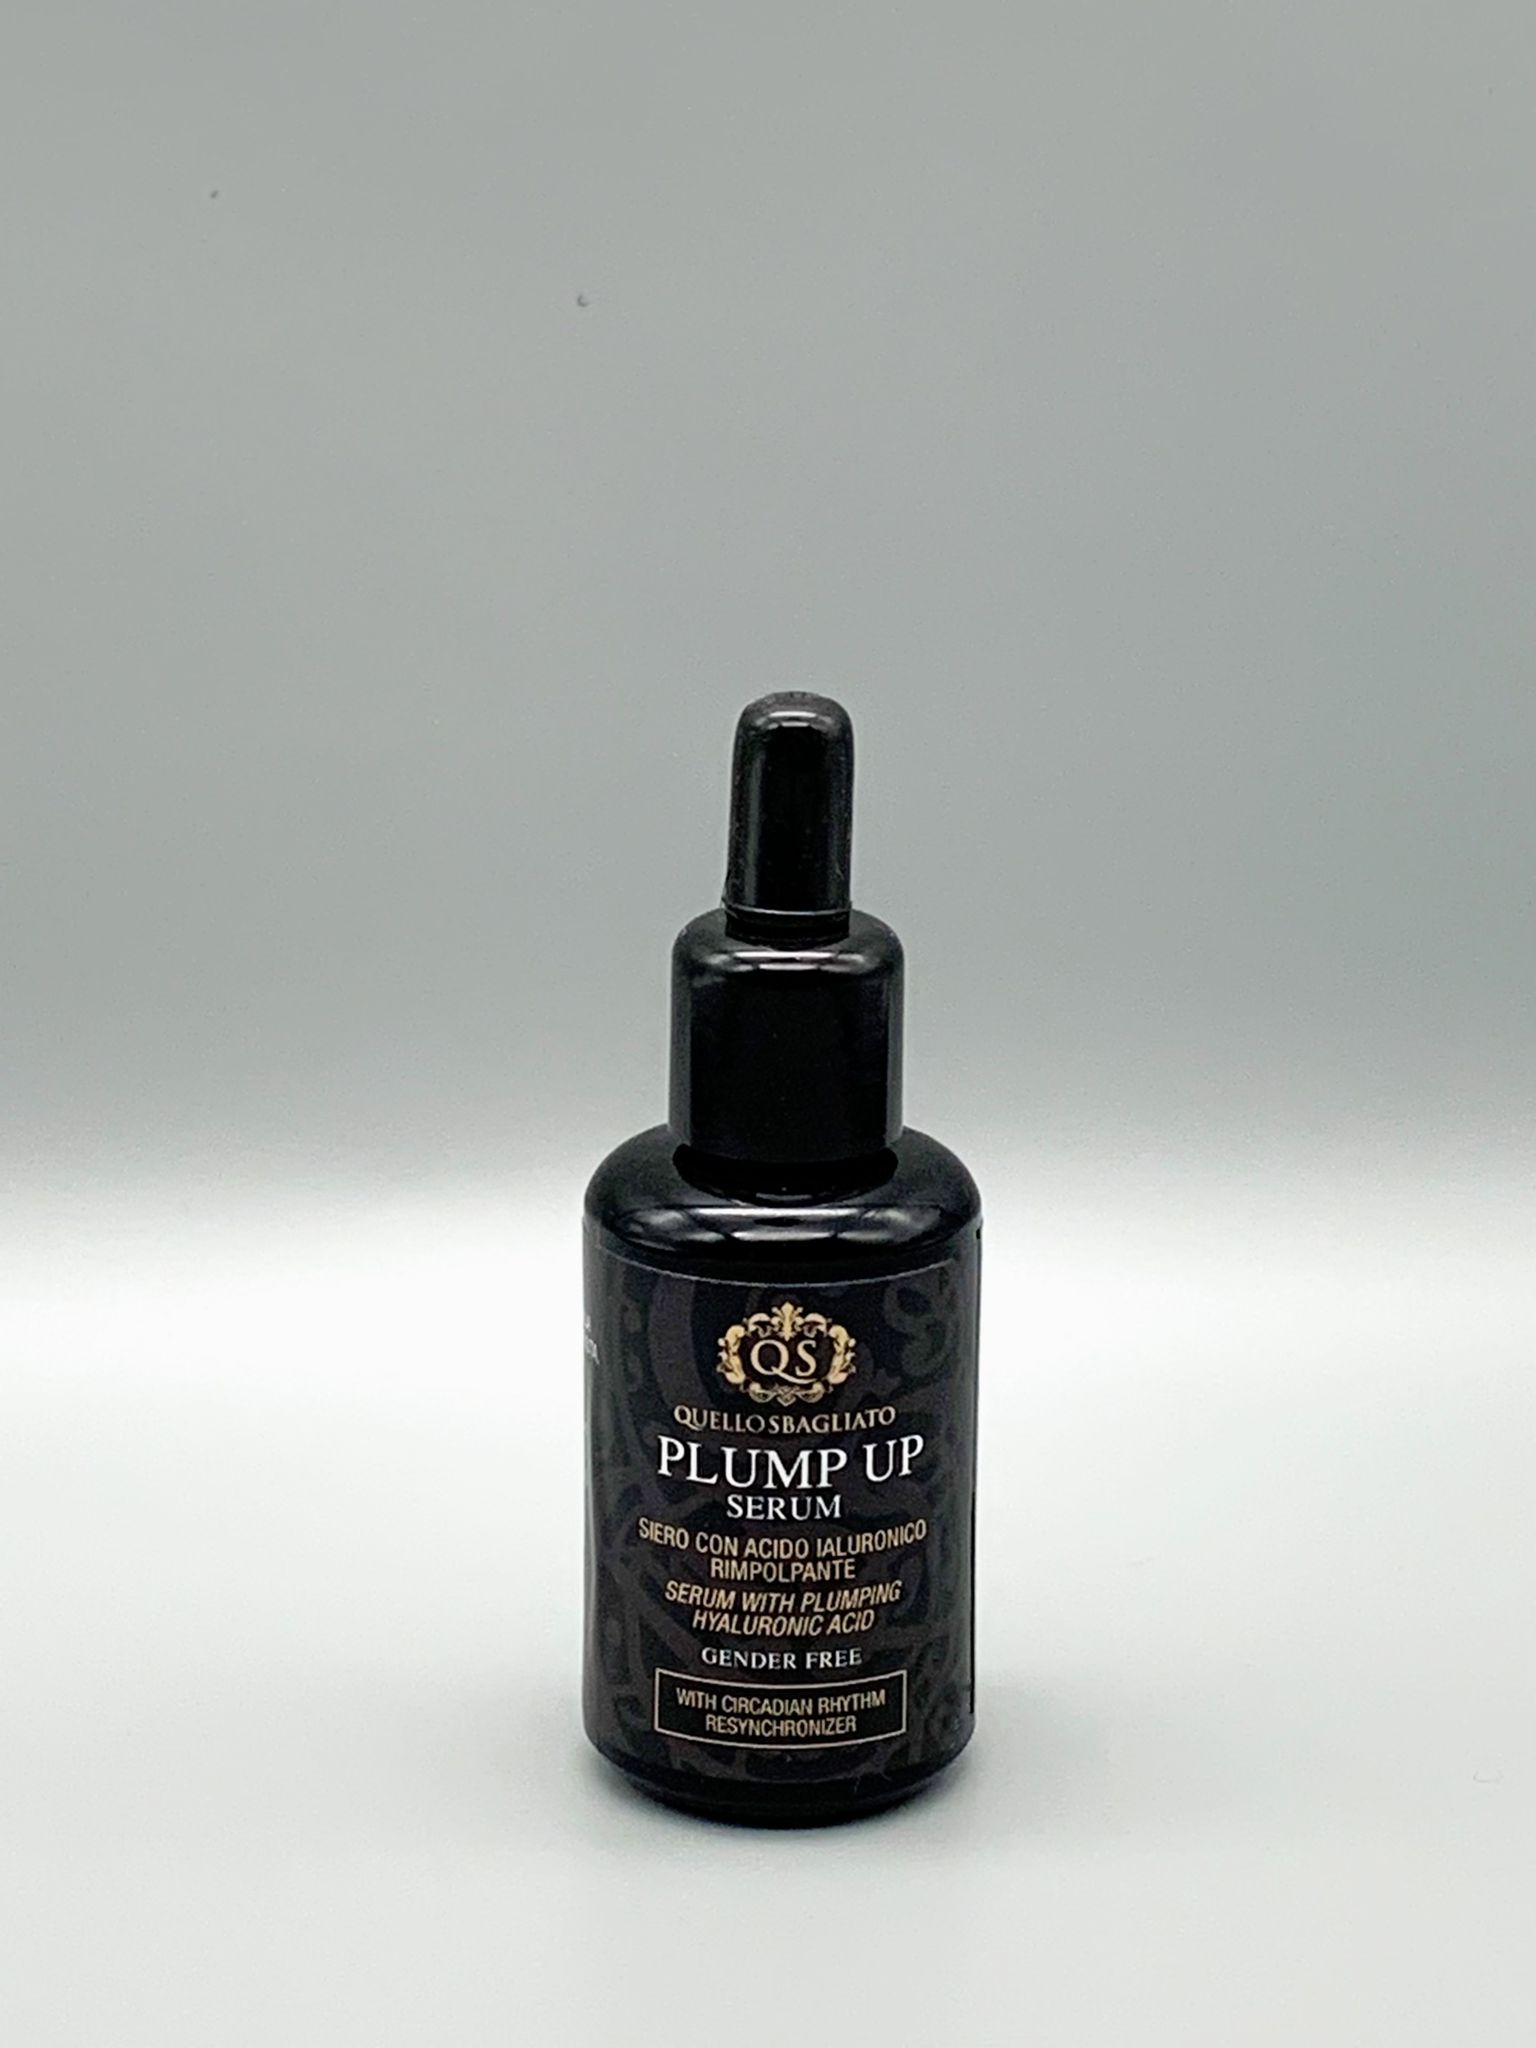 siero viso con acido ialuronico antiage rimpolpante plump up serum